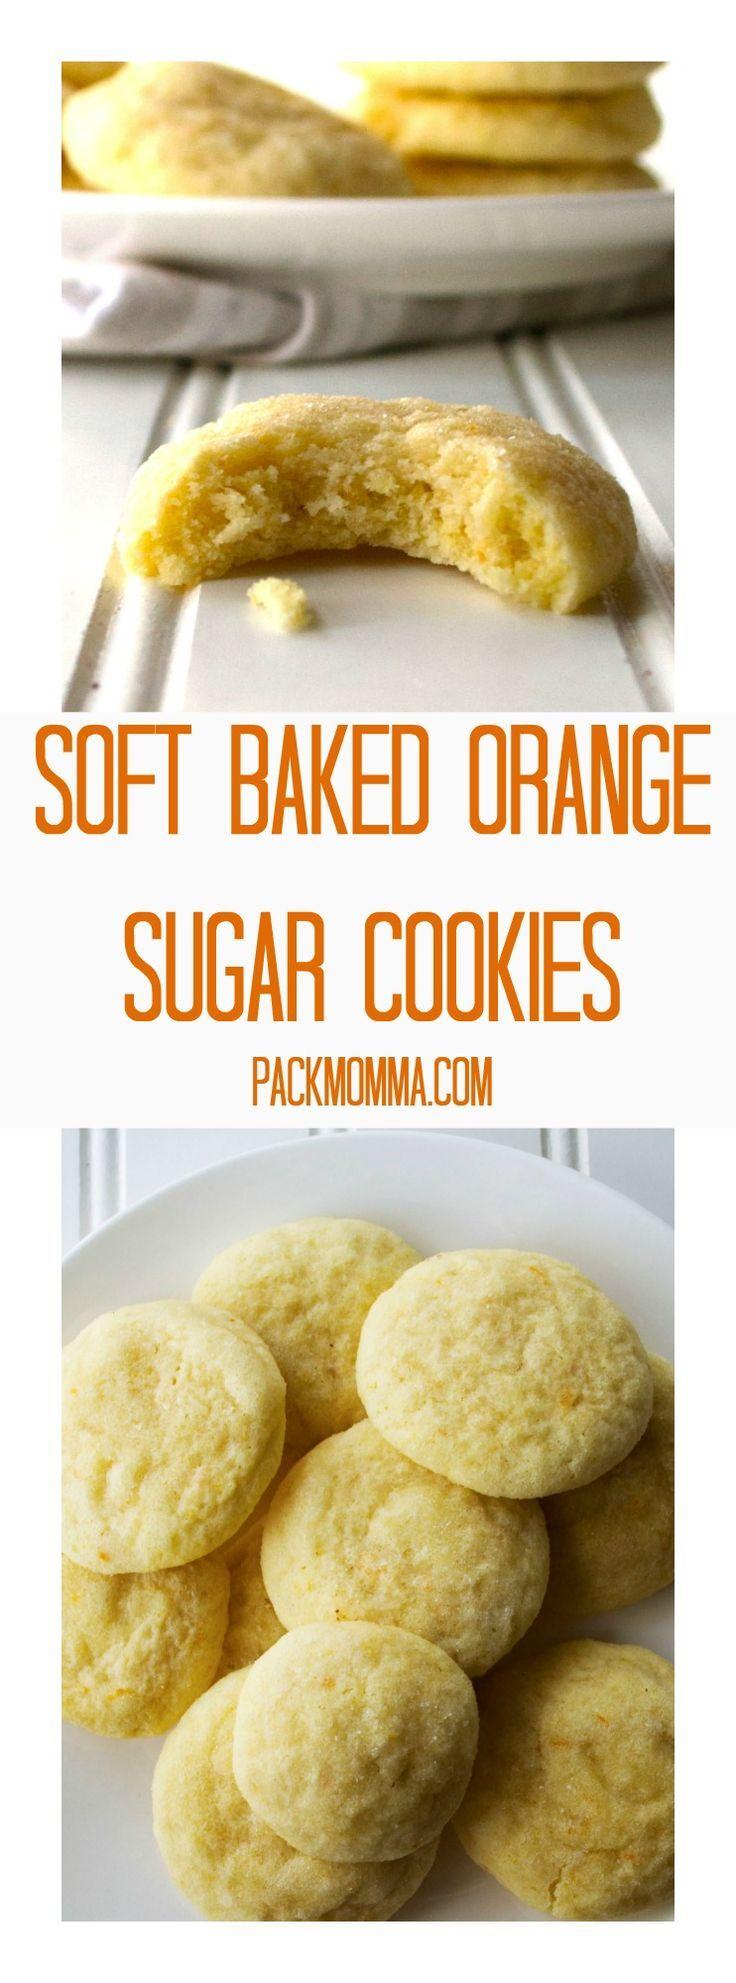 Soft Baked Orange Sugar Cookies   Pack Momma